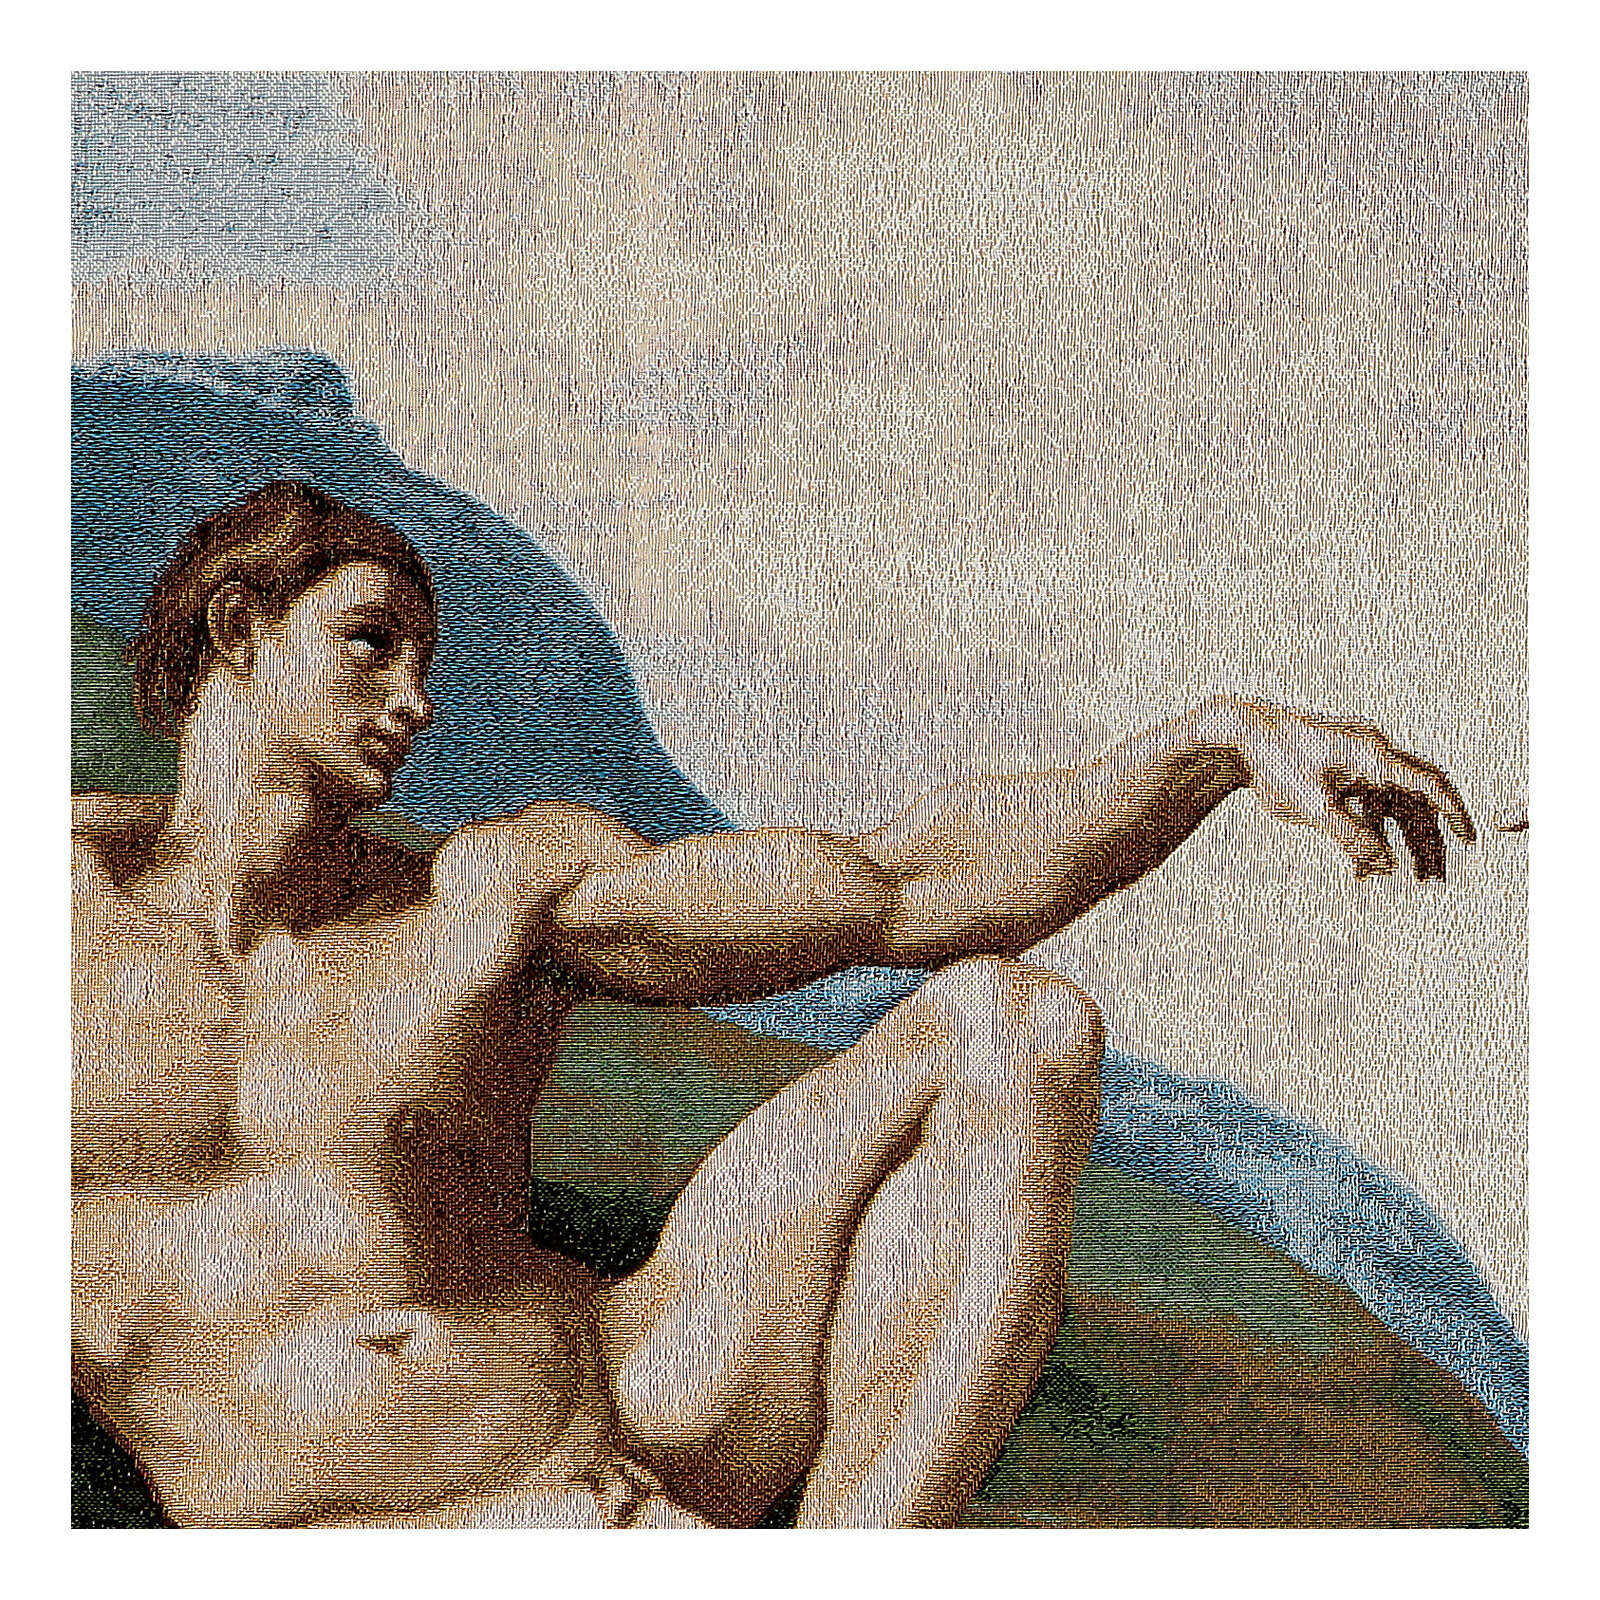 Tapisserie La création de Adam 130x72cm 3